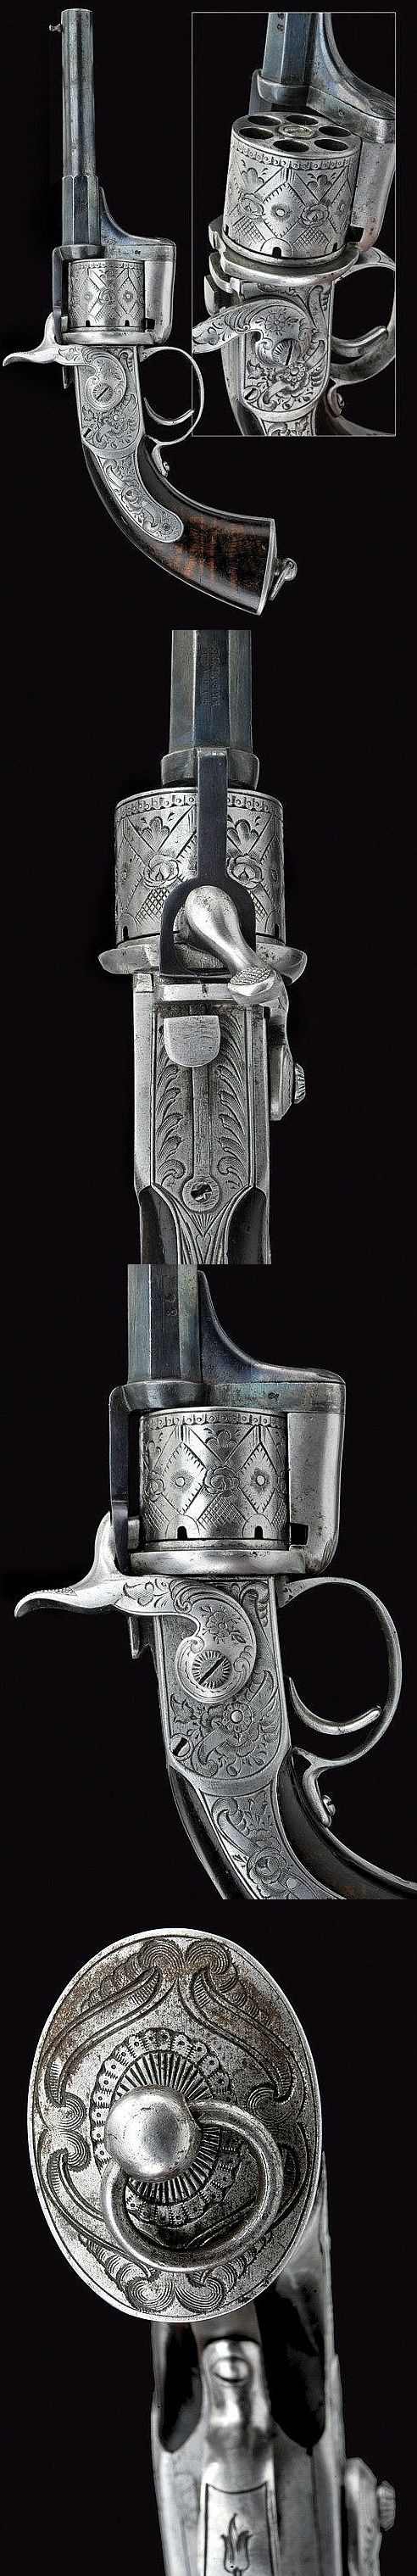 "A rare ""Eyraud"" pin-fire revolver, France, 19th century."